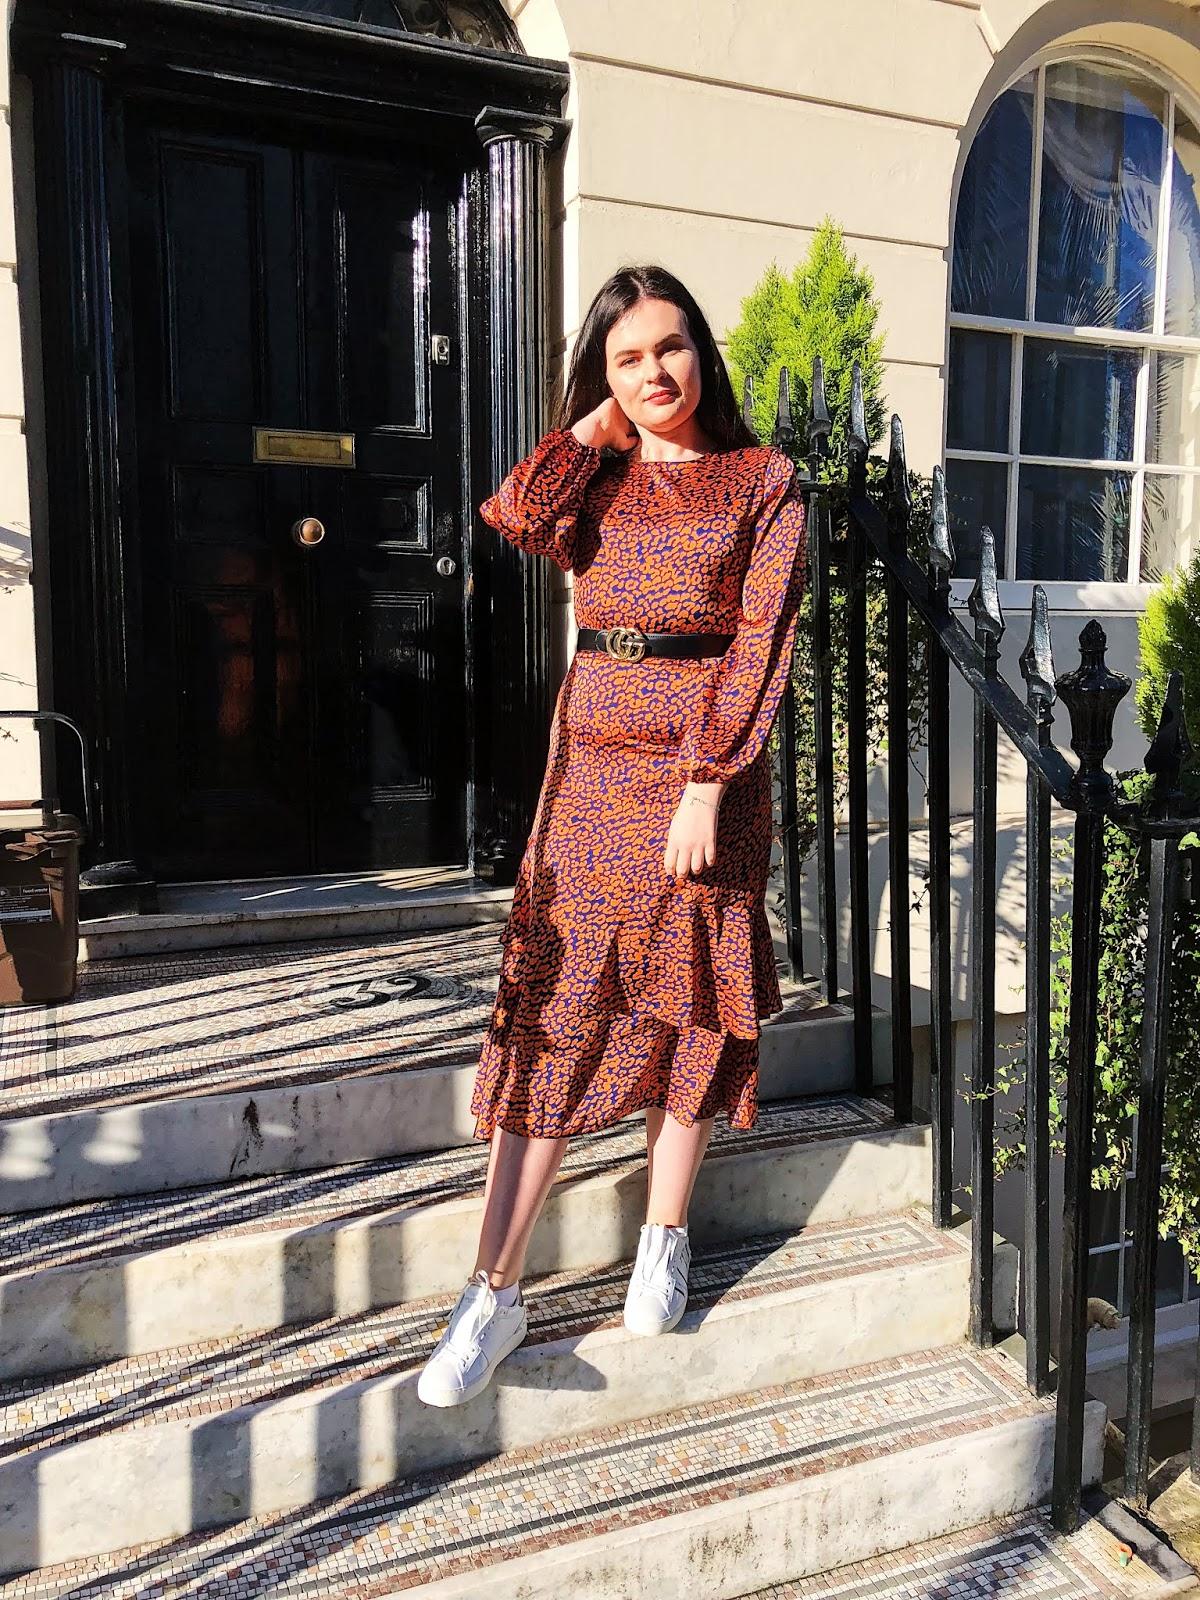 john zack dresses, john zack leopard print, animal print 2019, trends 2019, leopard print trend, favourite animal print pieces 2019